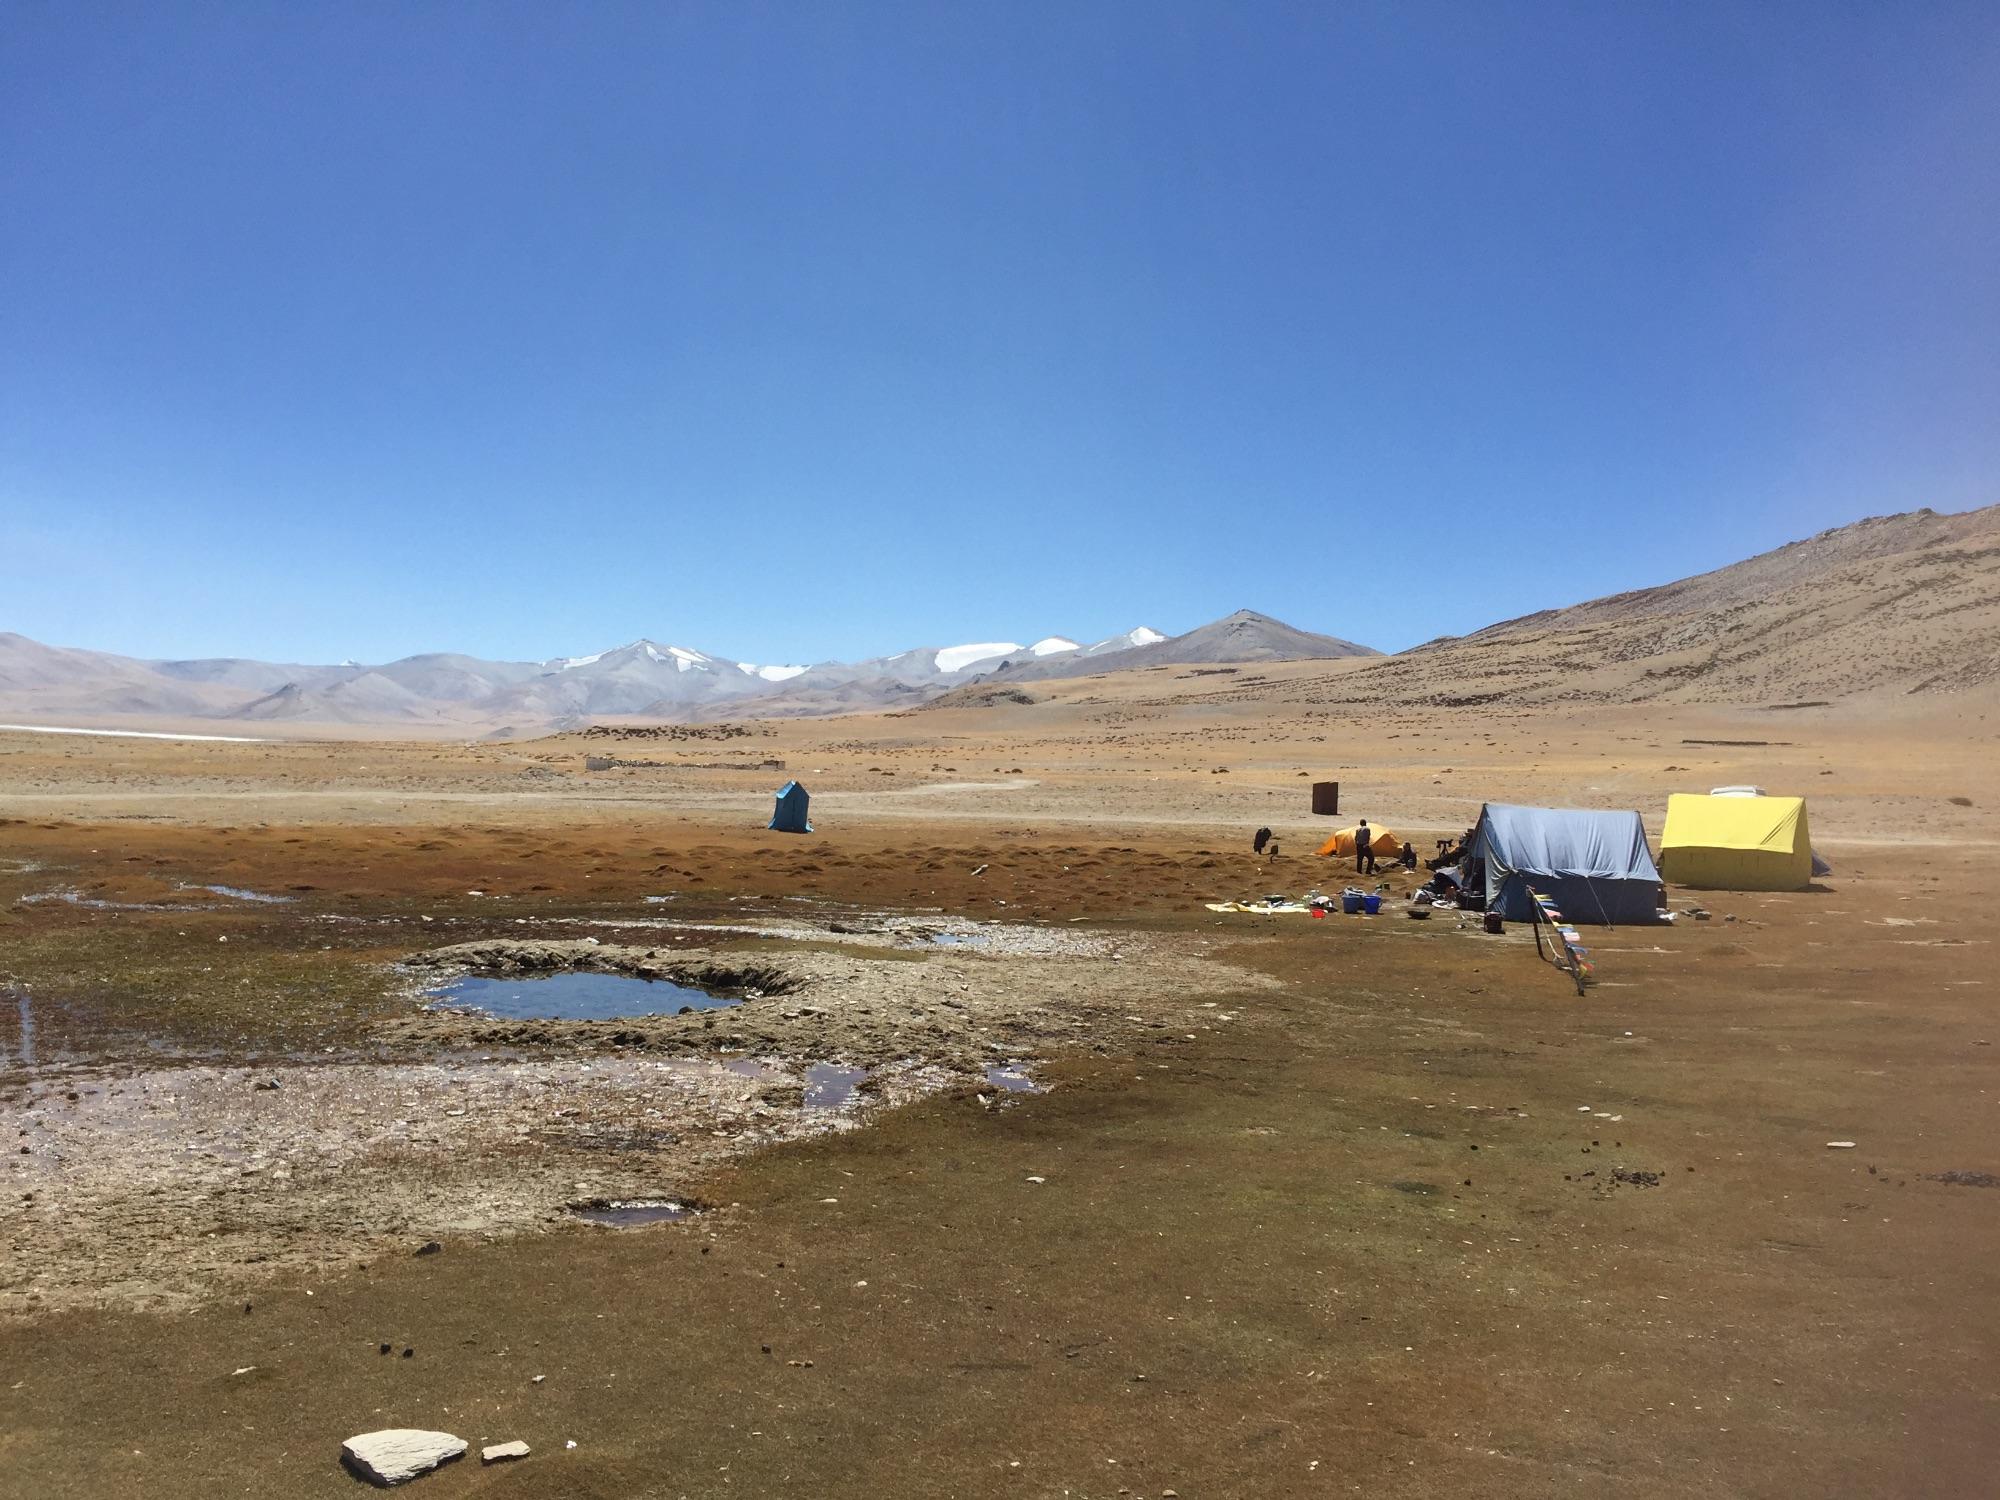 Tso Kar Camp